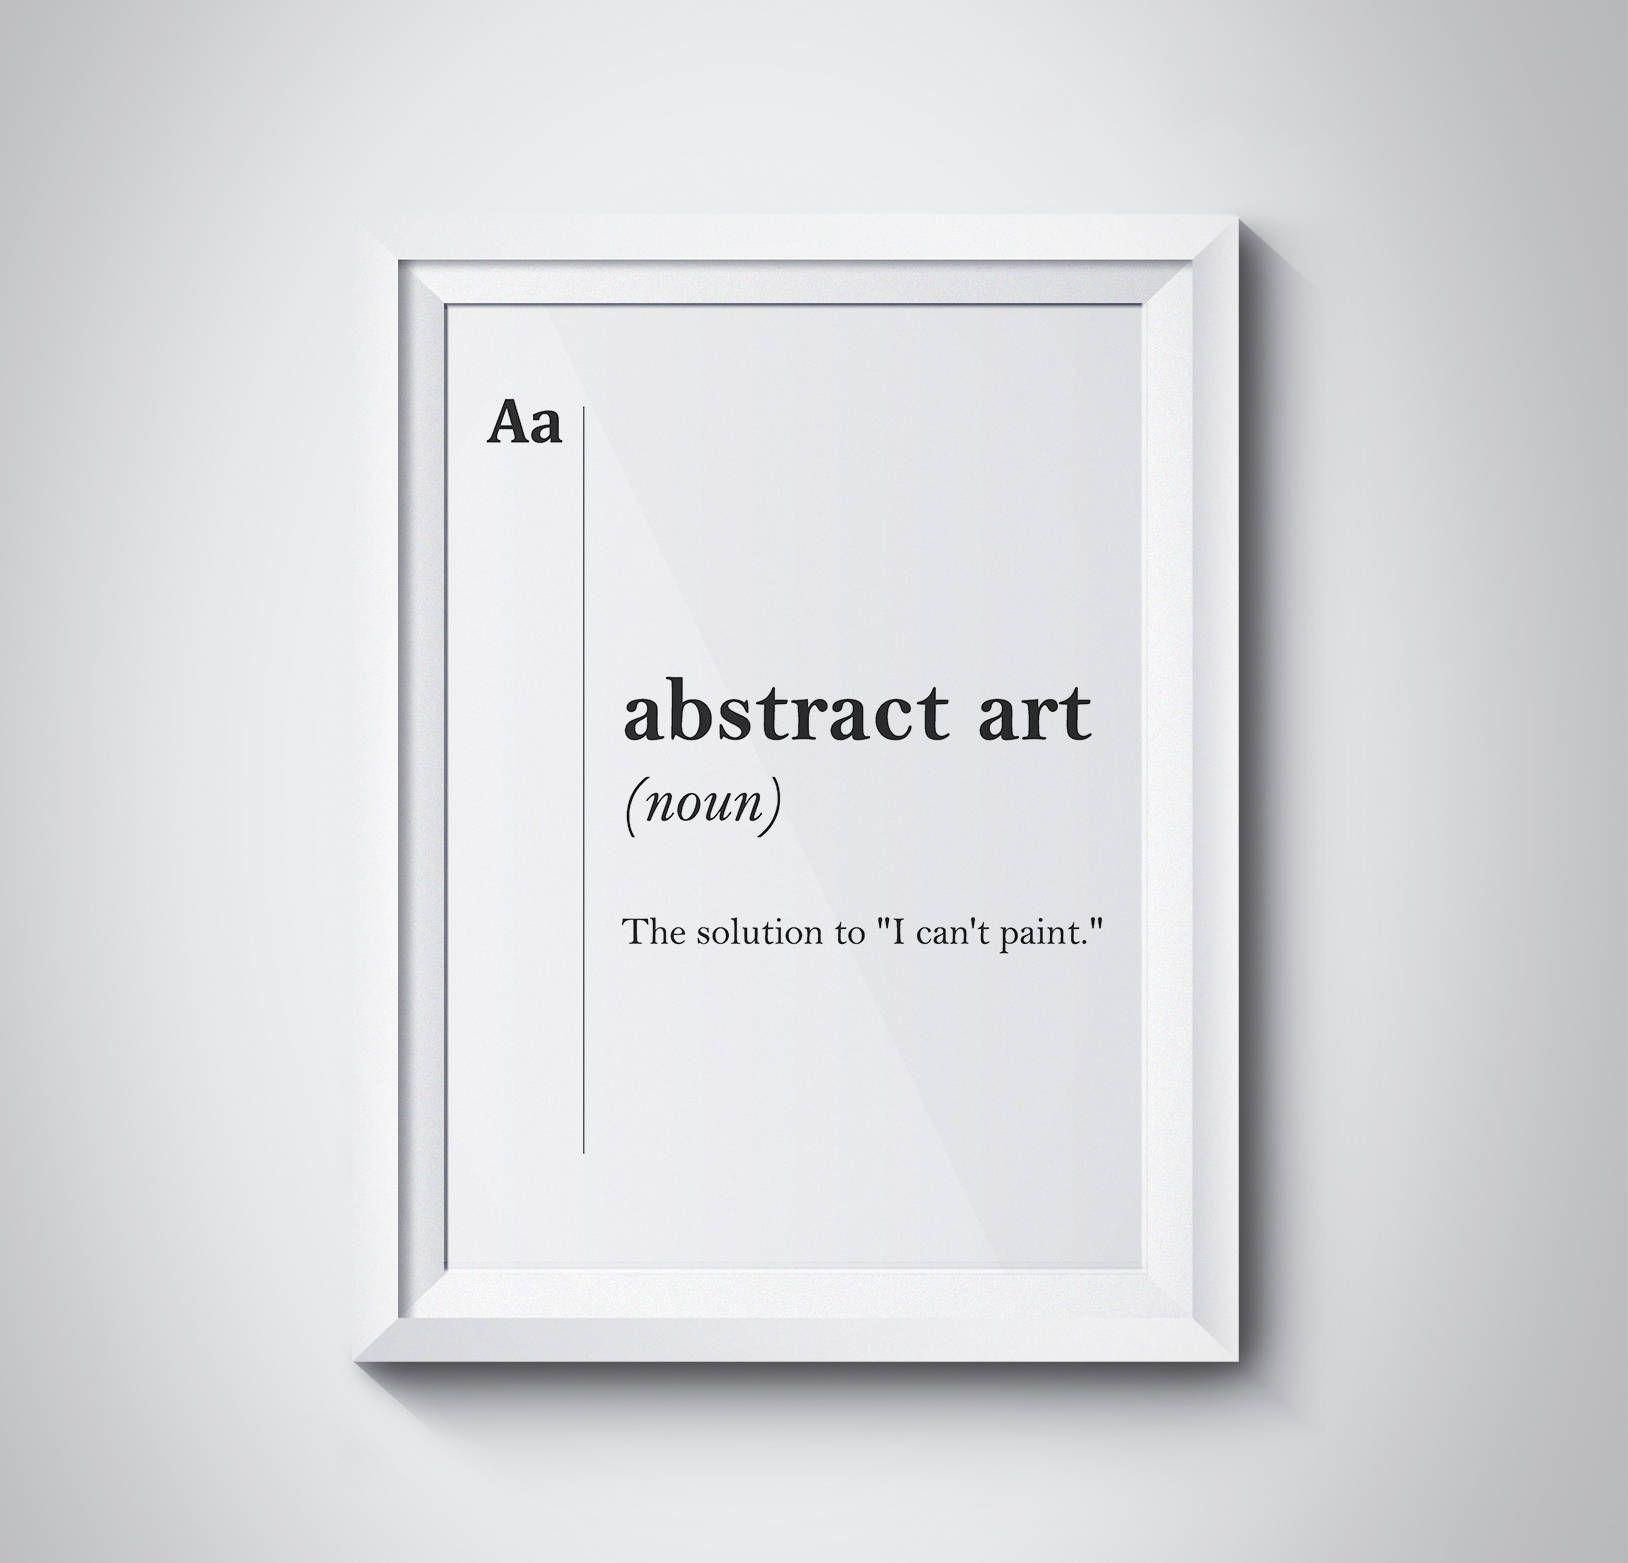 Abstract Art Definition Artist Gift Dictionary Artist Studio Decor Minimalist Scandinavian Diplomat Gift For Artist Print Abstract Poster Gifts For An Artist Artist Gifts Word Wall Art